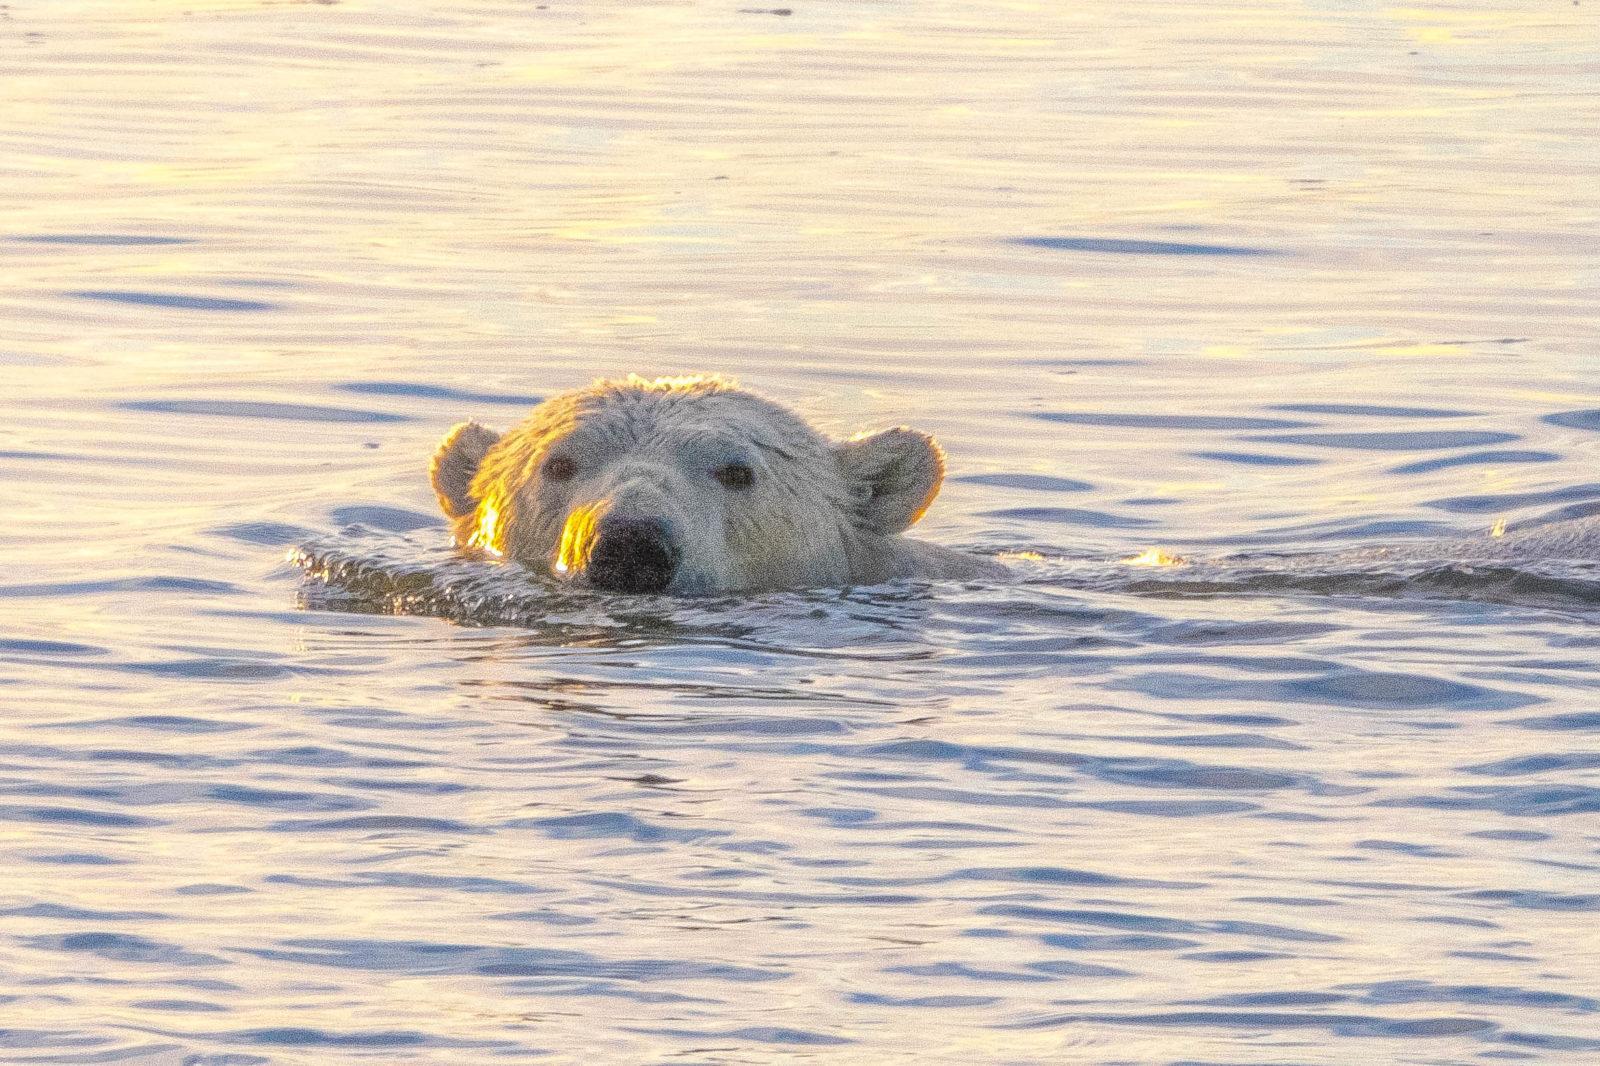 Swimming polar bear. Biden regulation imperils polar bears.